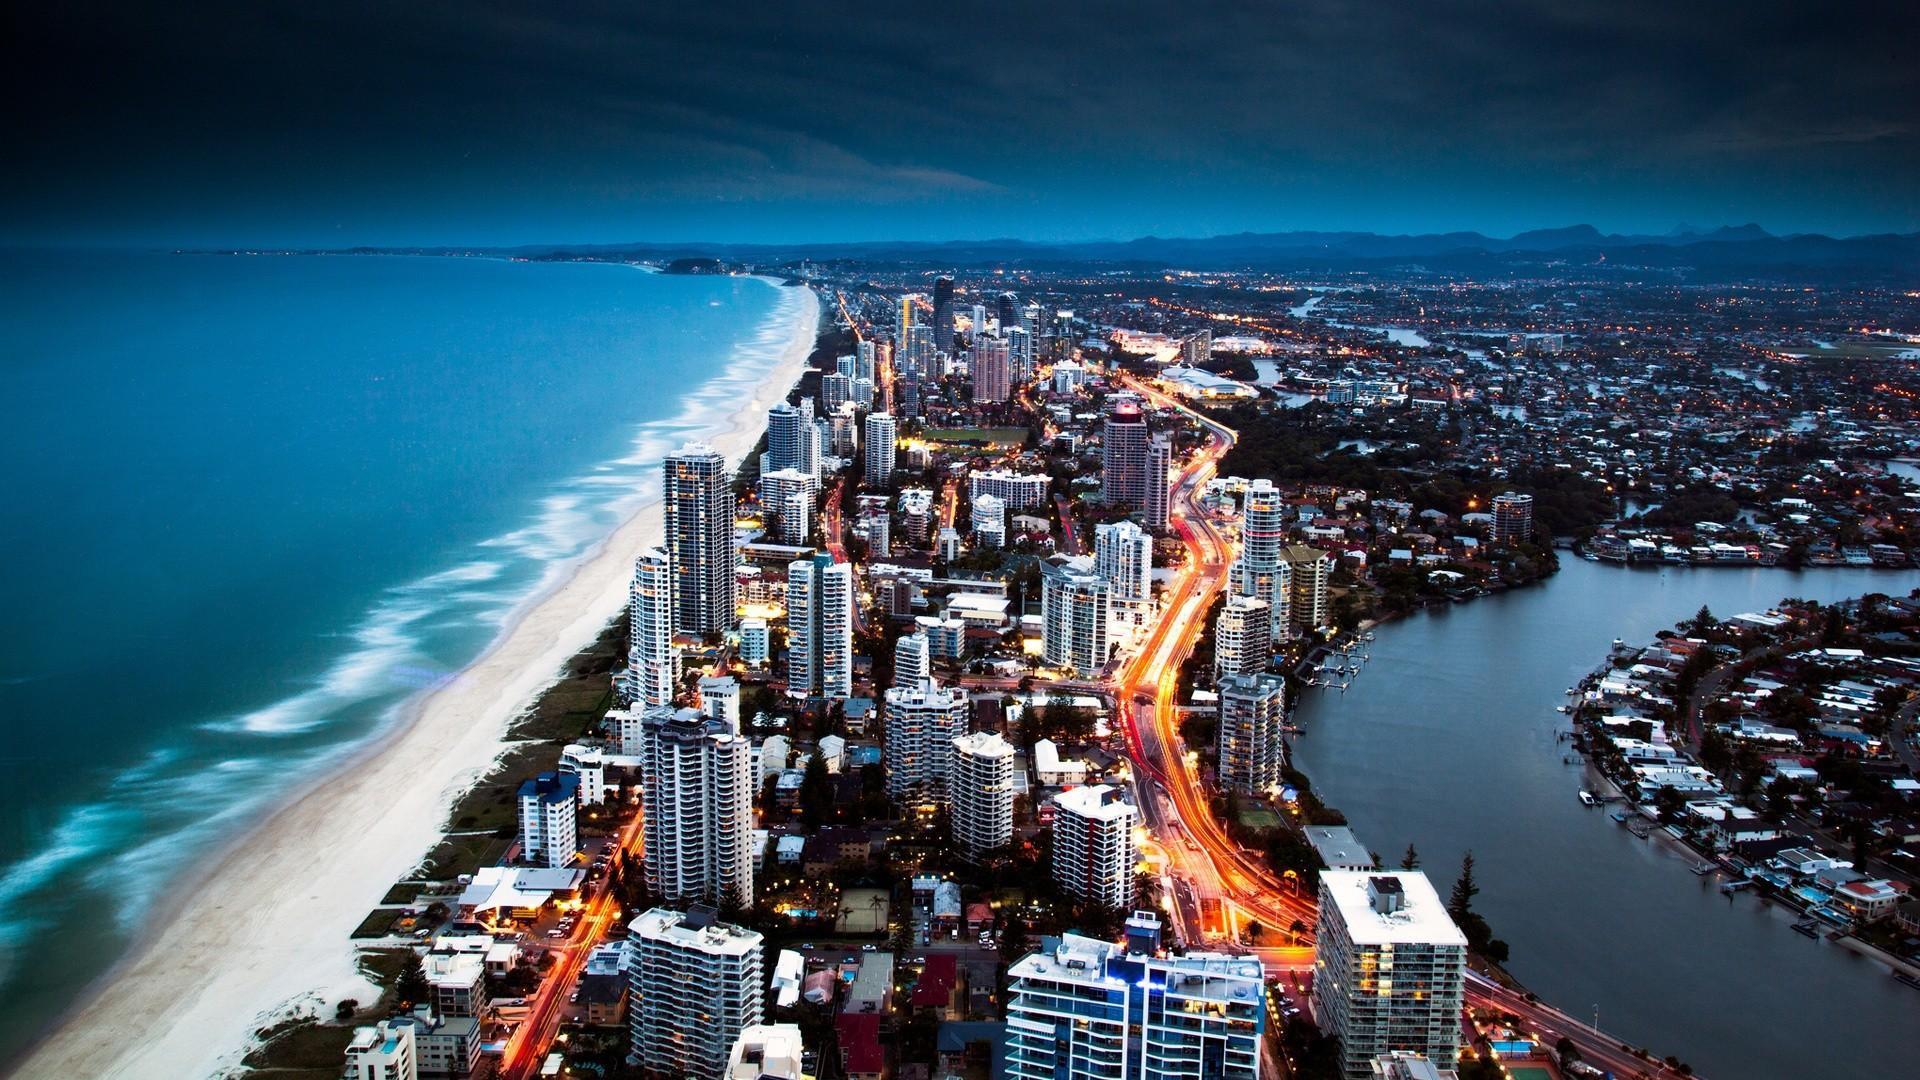 Cityscapes australia nighttime gold coast australia, nighttime, gold,  coast) via www.in